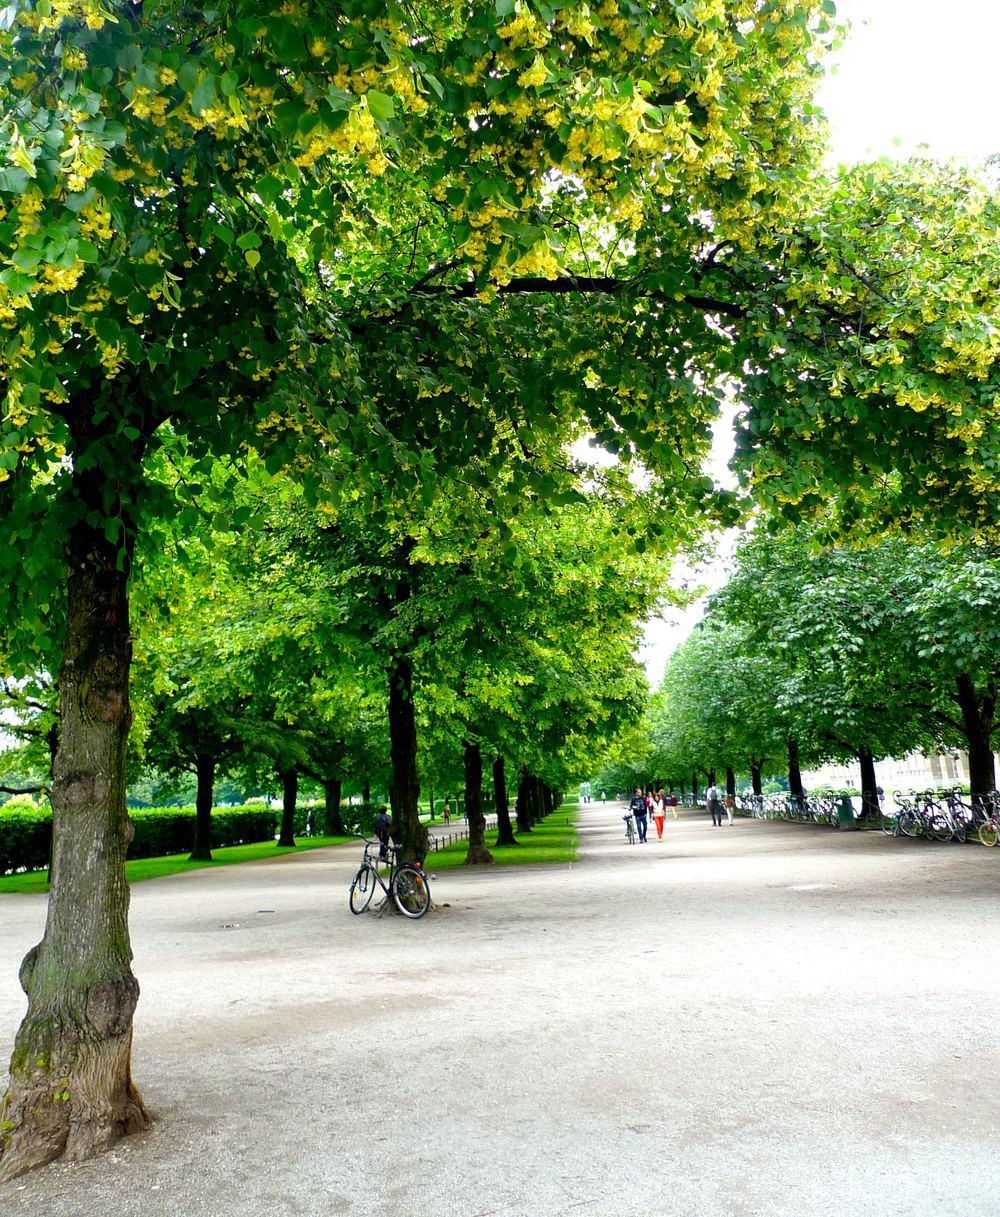 Avenueoftrees